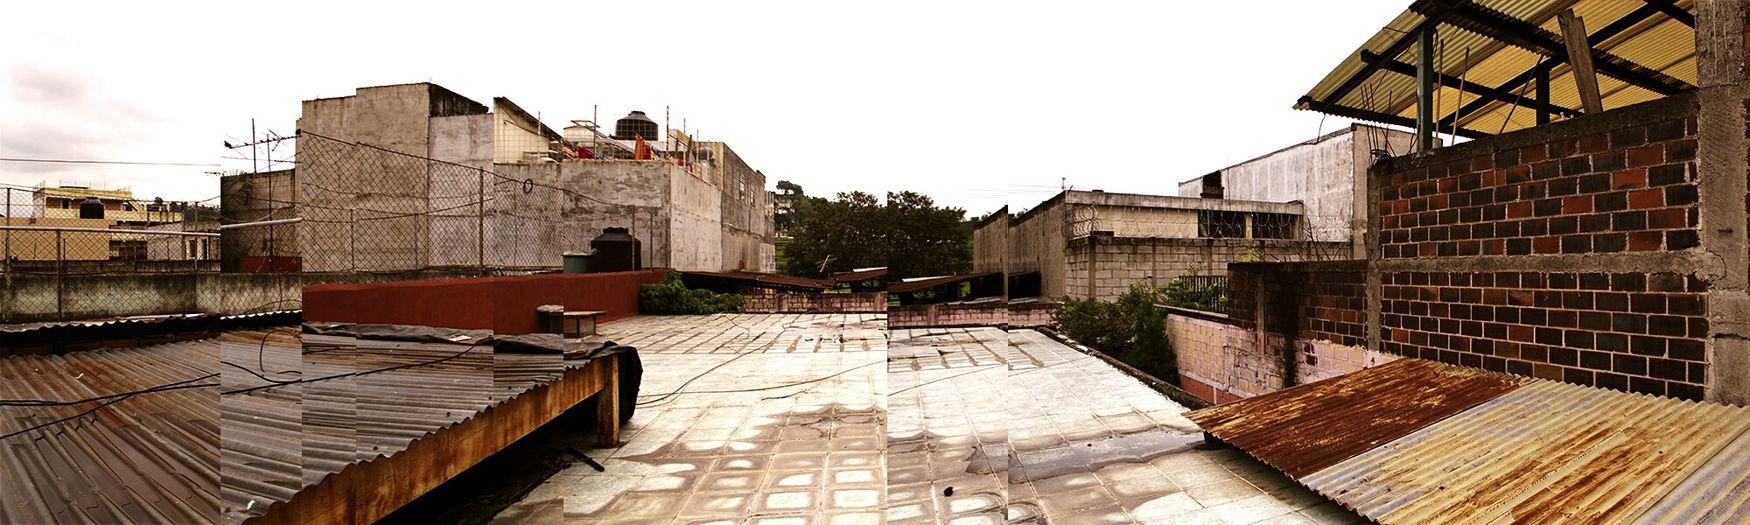 Intento fallido de panoramica con Nikon D3100 No People Outdoors City Cloud - Sky Sky